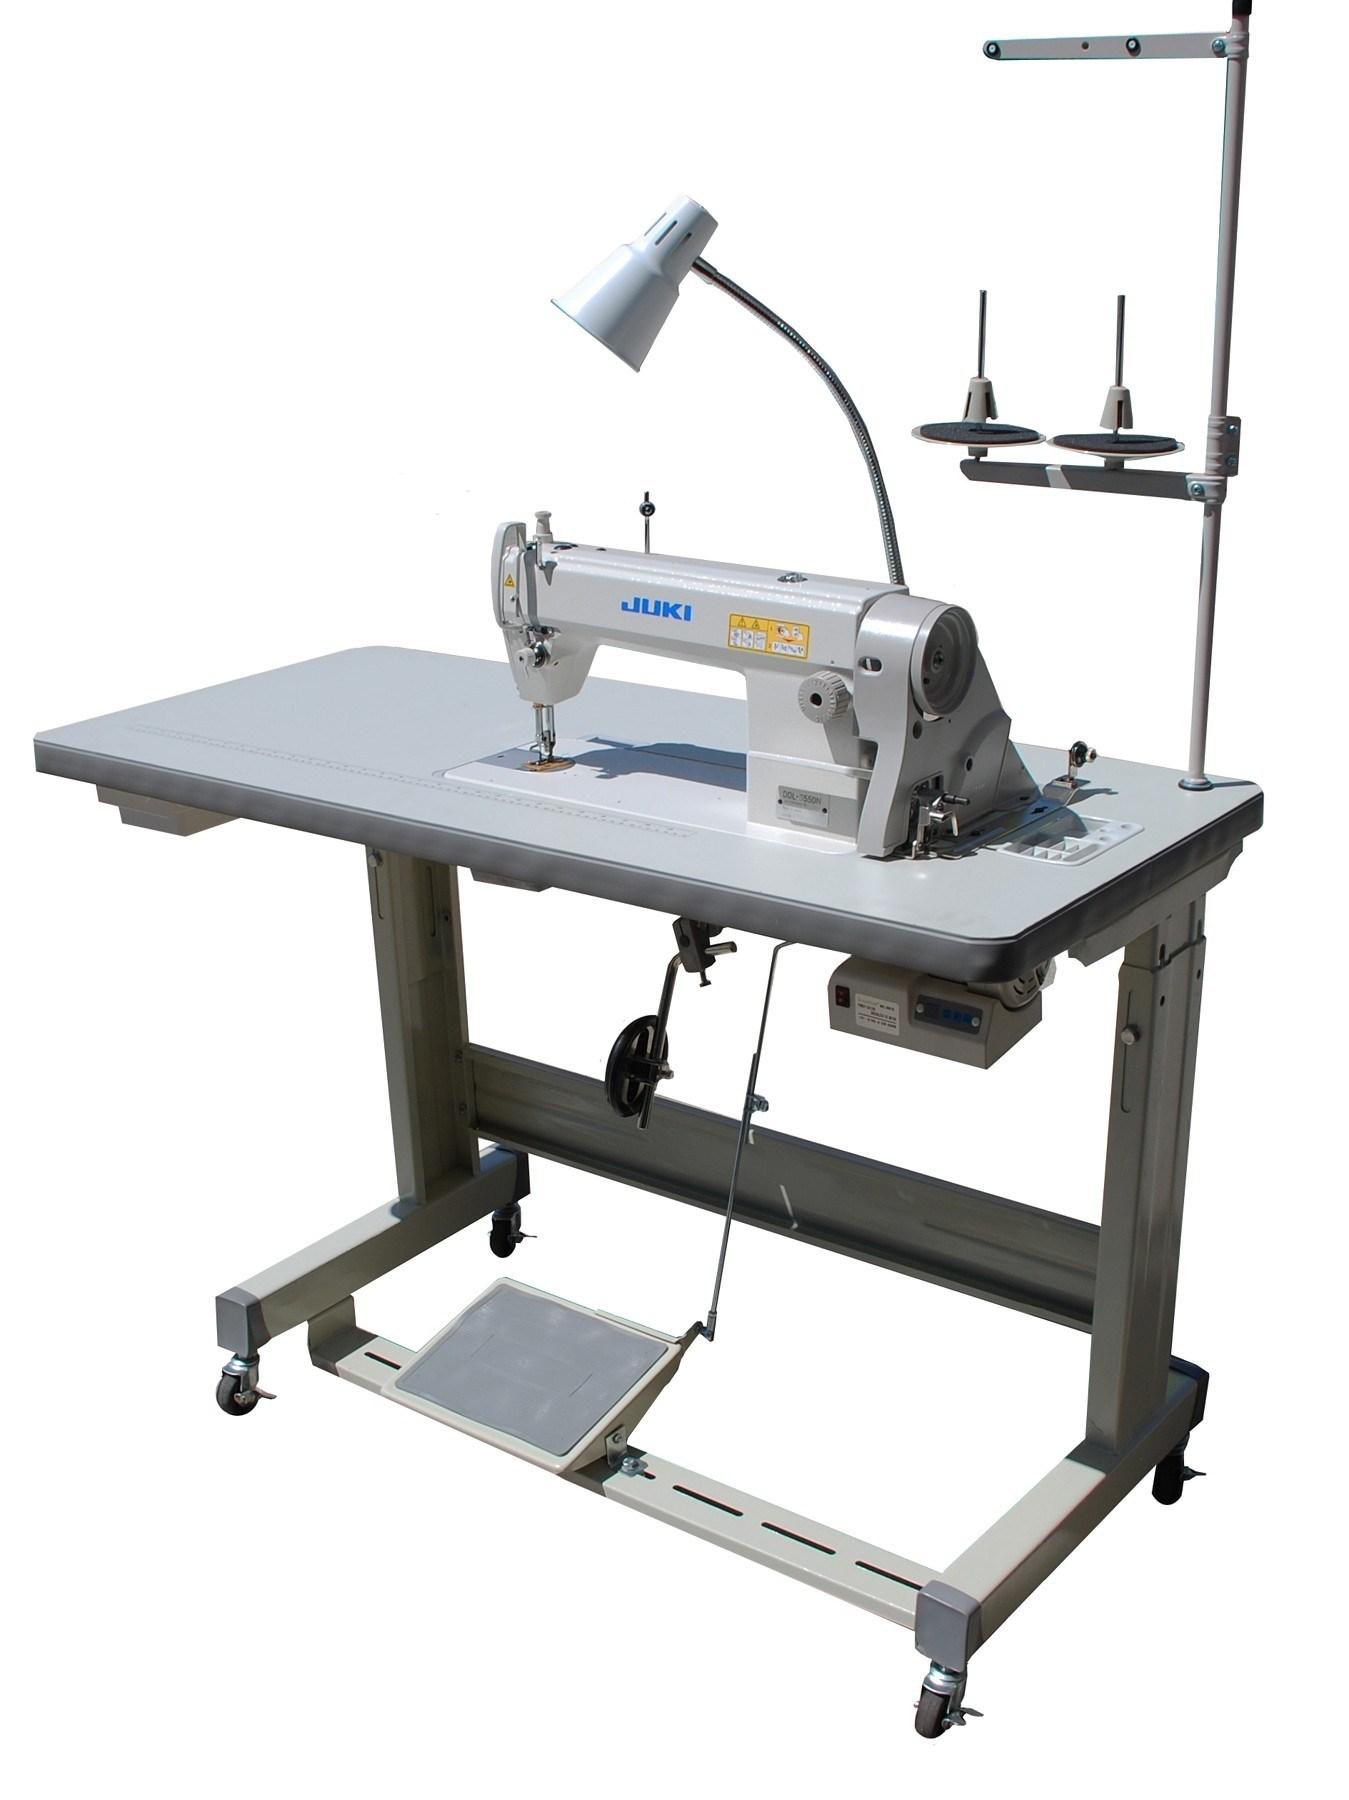 Juki-industrial-sewing-machine